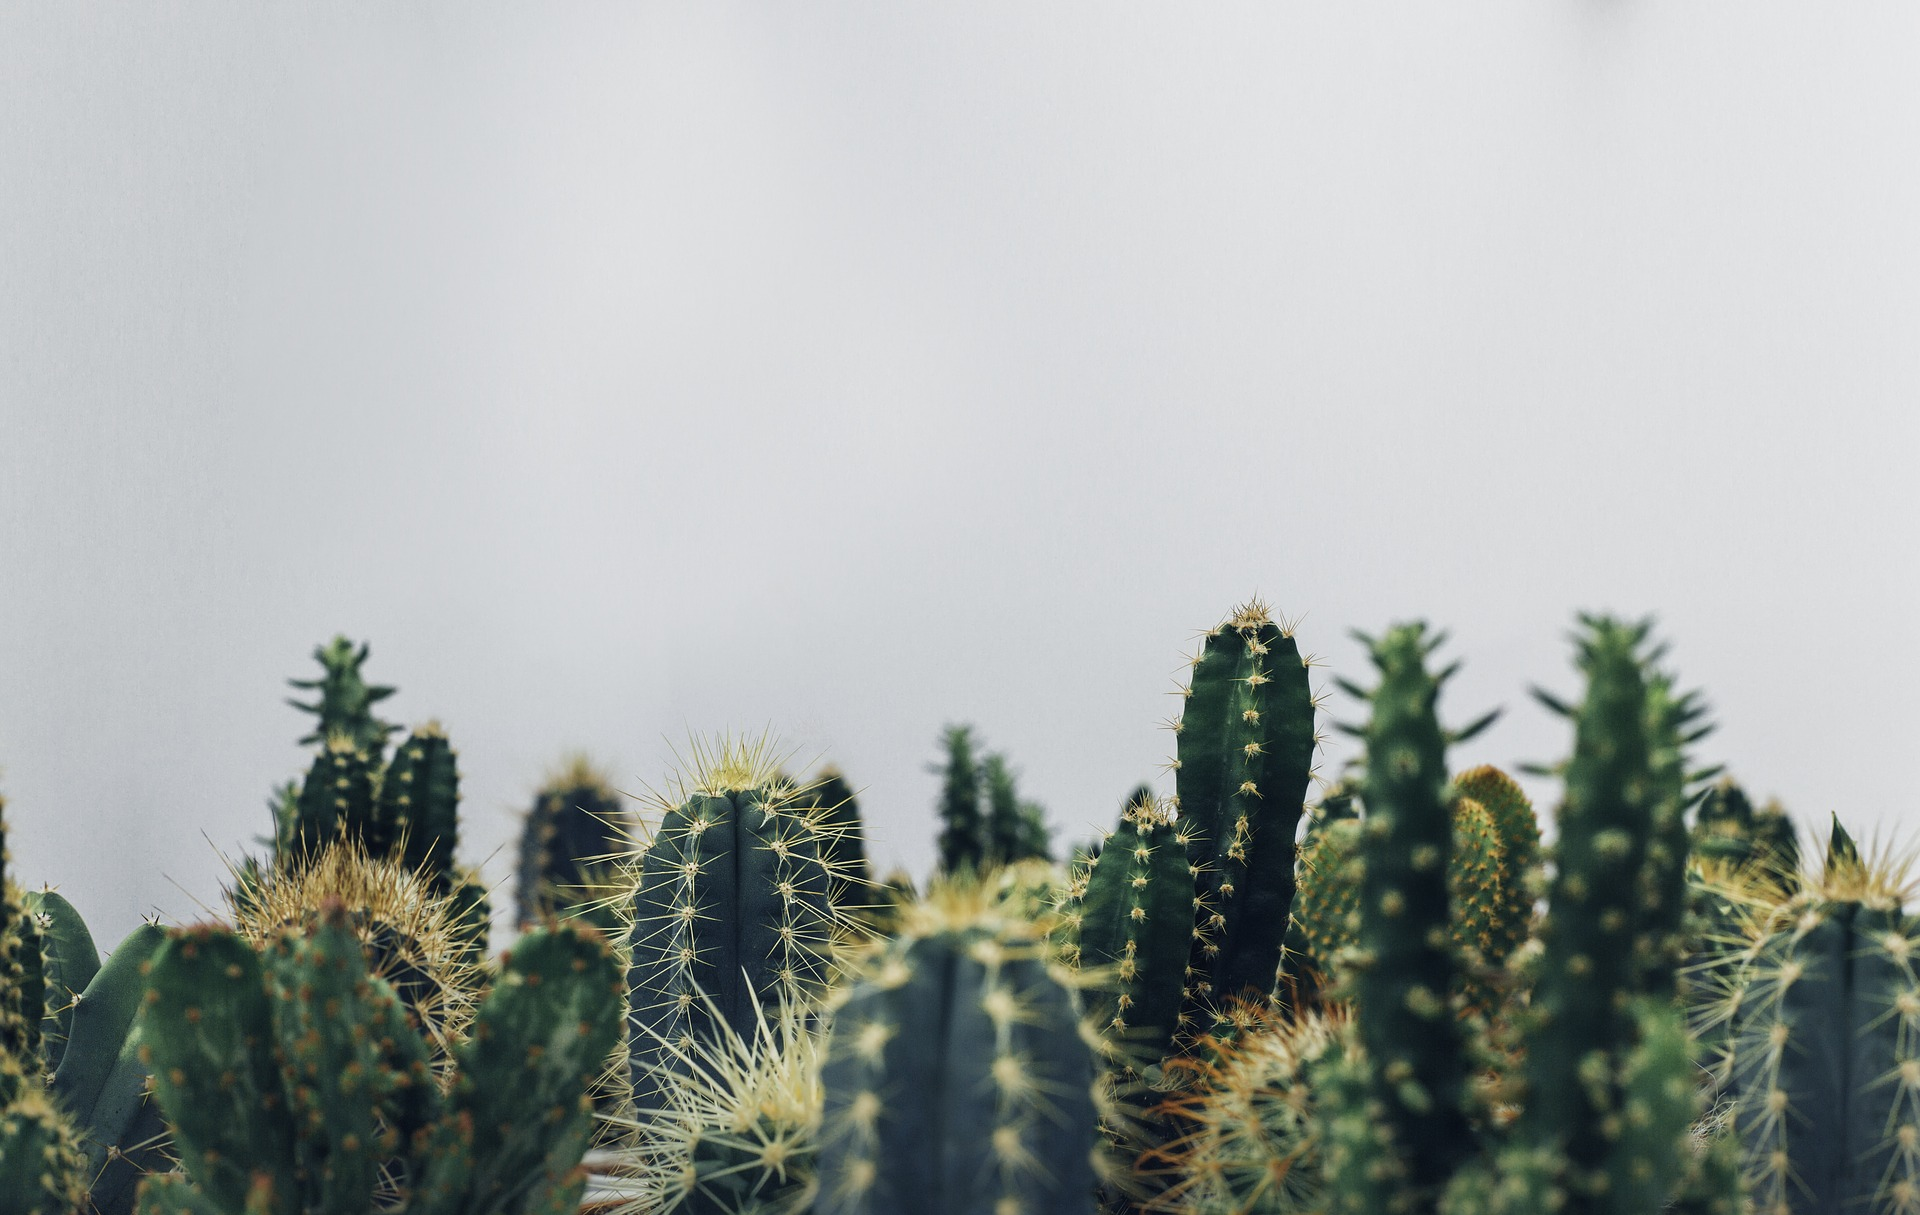 cacti-1834749_1920